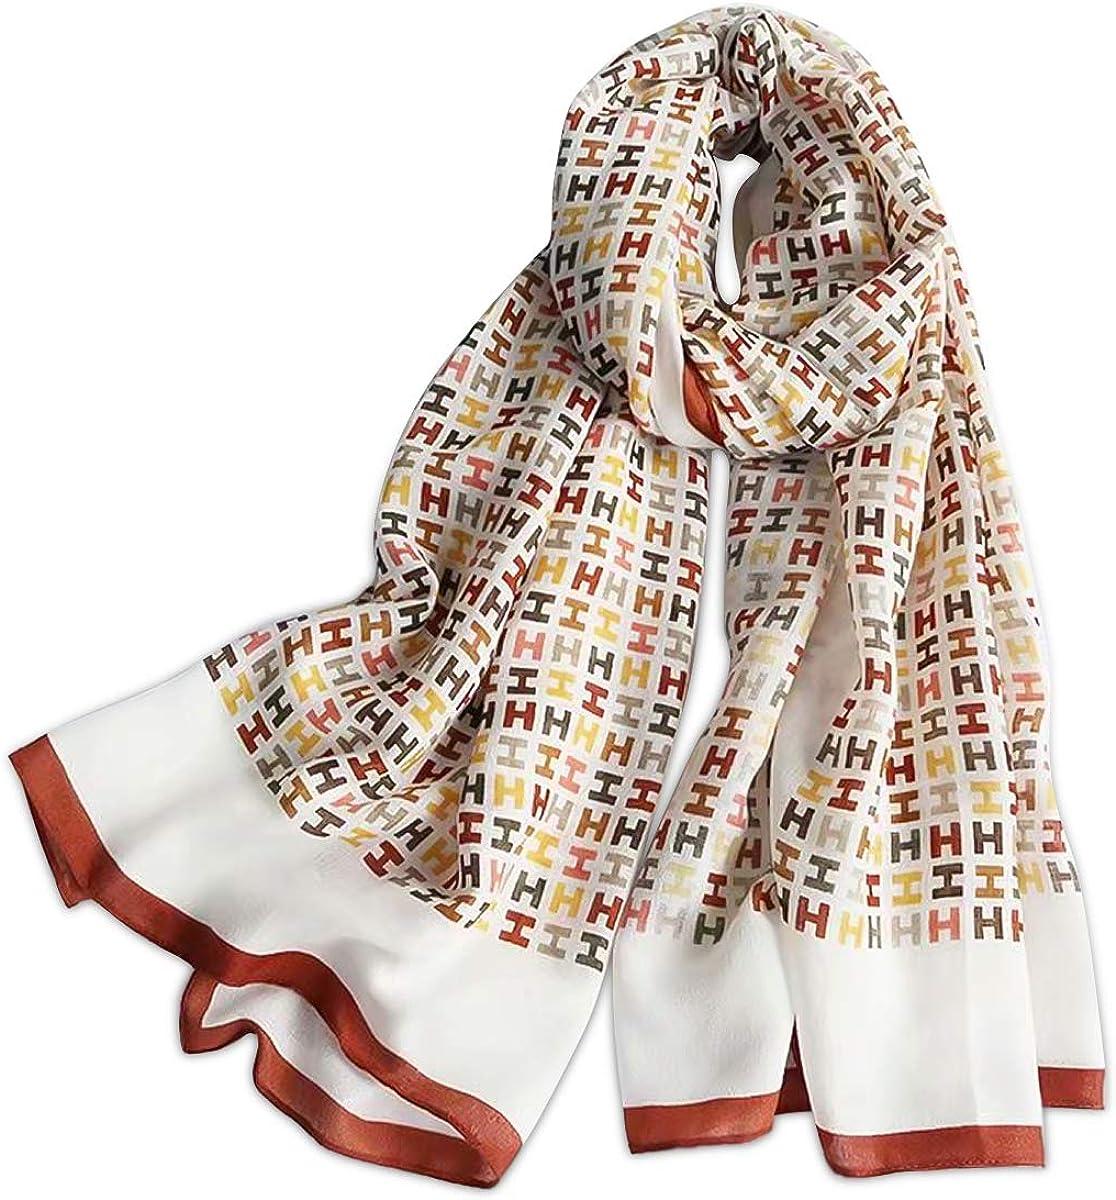 LumiSyne Spring Women Girl Scarf Soft Thin Cotton Scarf Mixed Colors Geometric Letter Pattern Fashion Warm Shawl Wrap